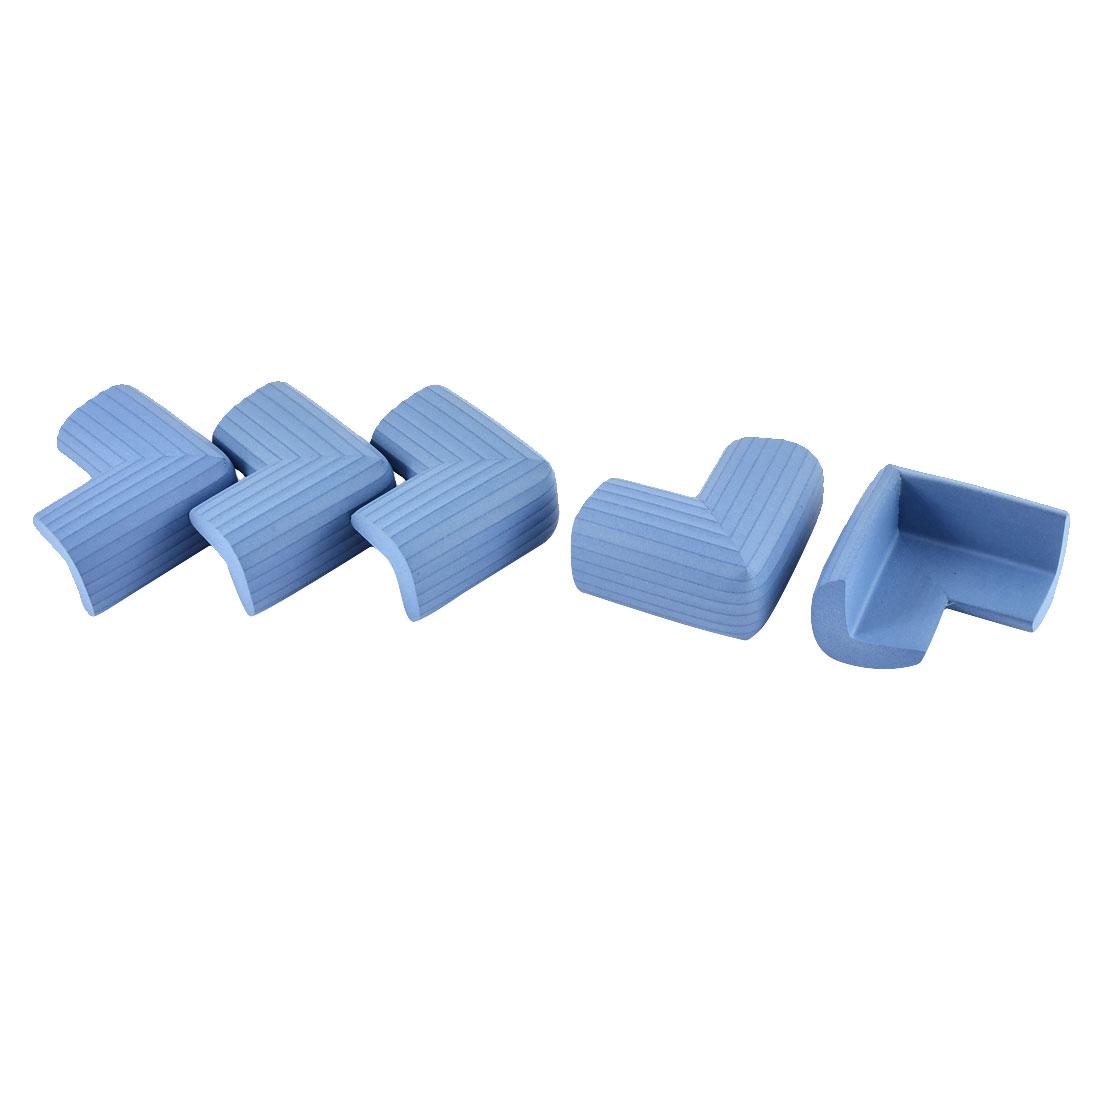 L Shape Strip Design Cushion Furniture Corner Edge Protector Blue 5PCS